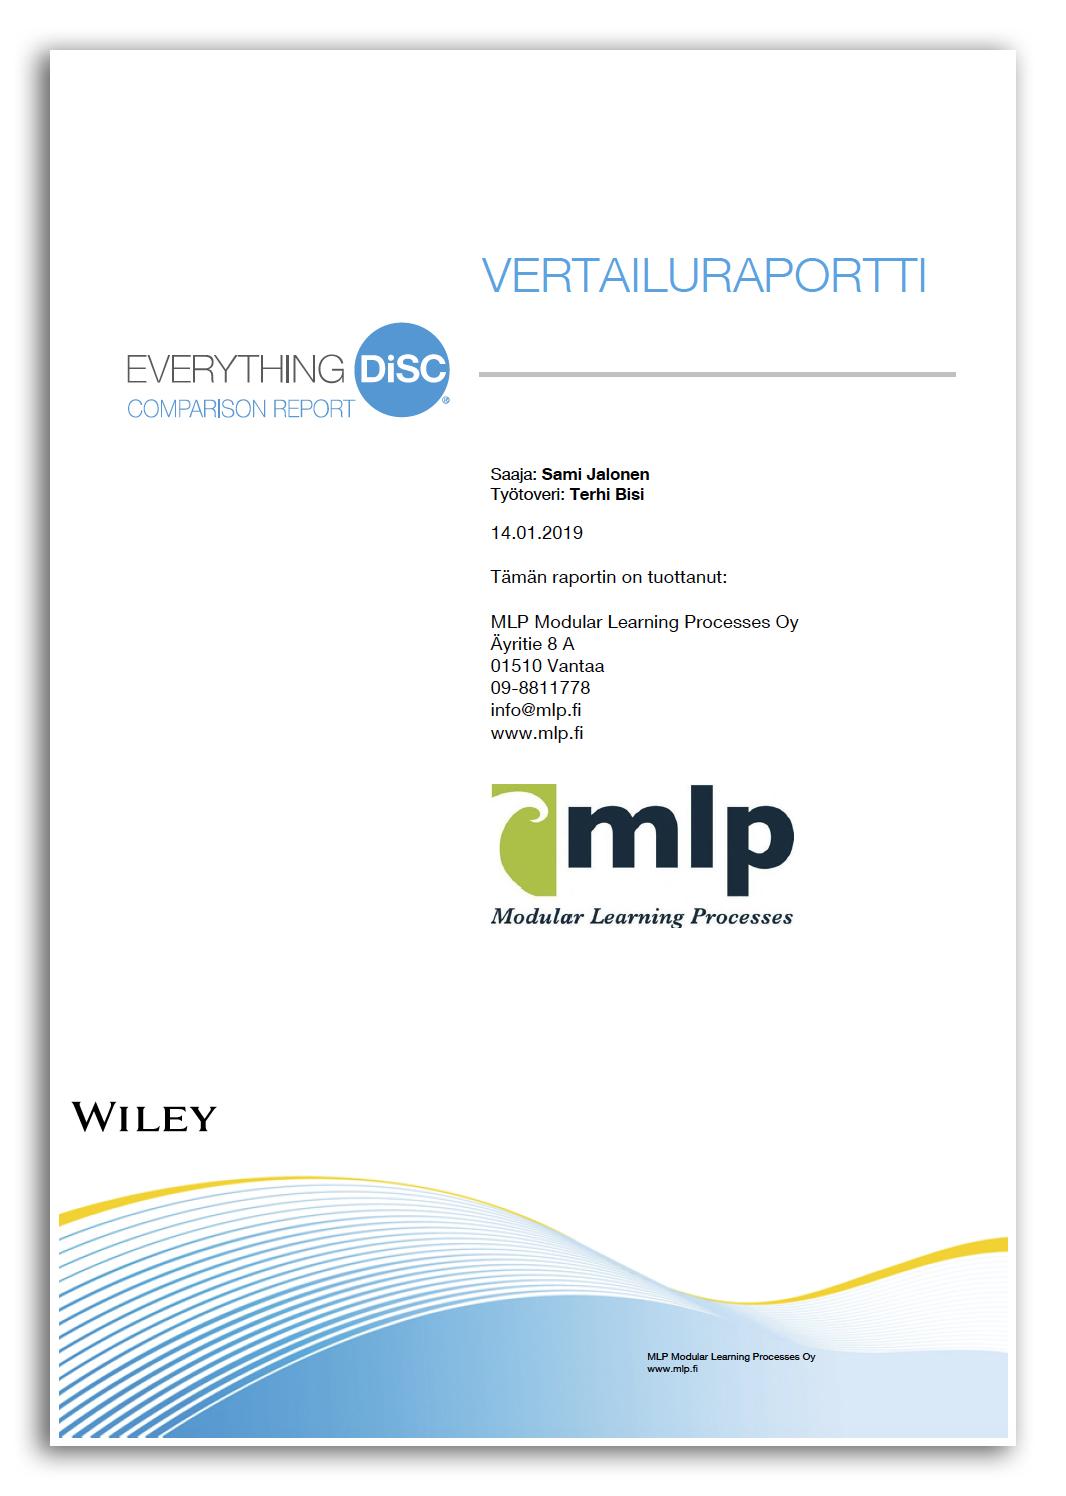 Vertailuraportti_cover